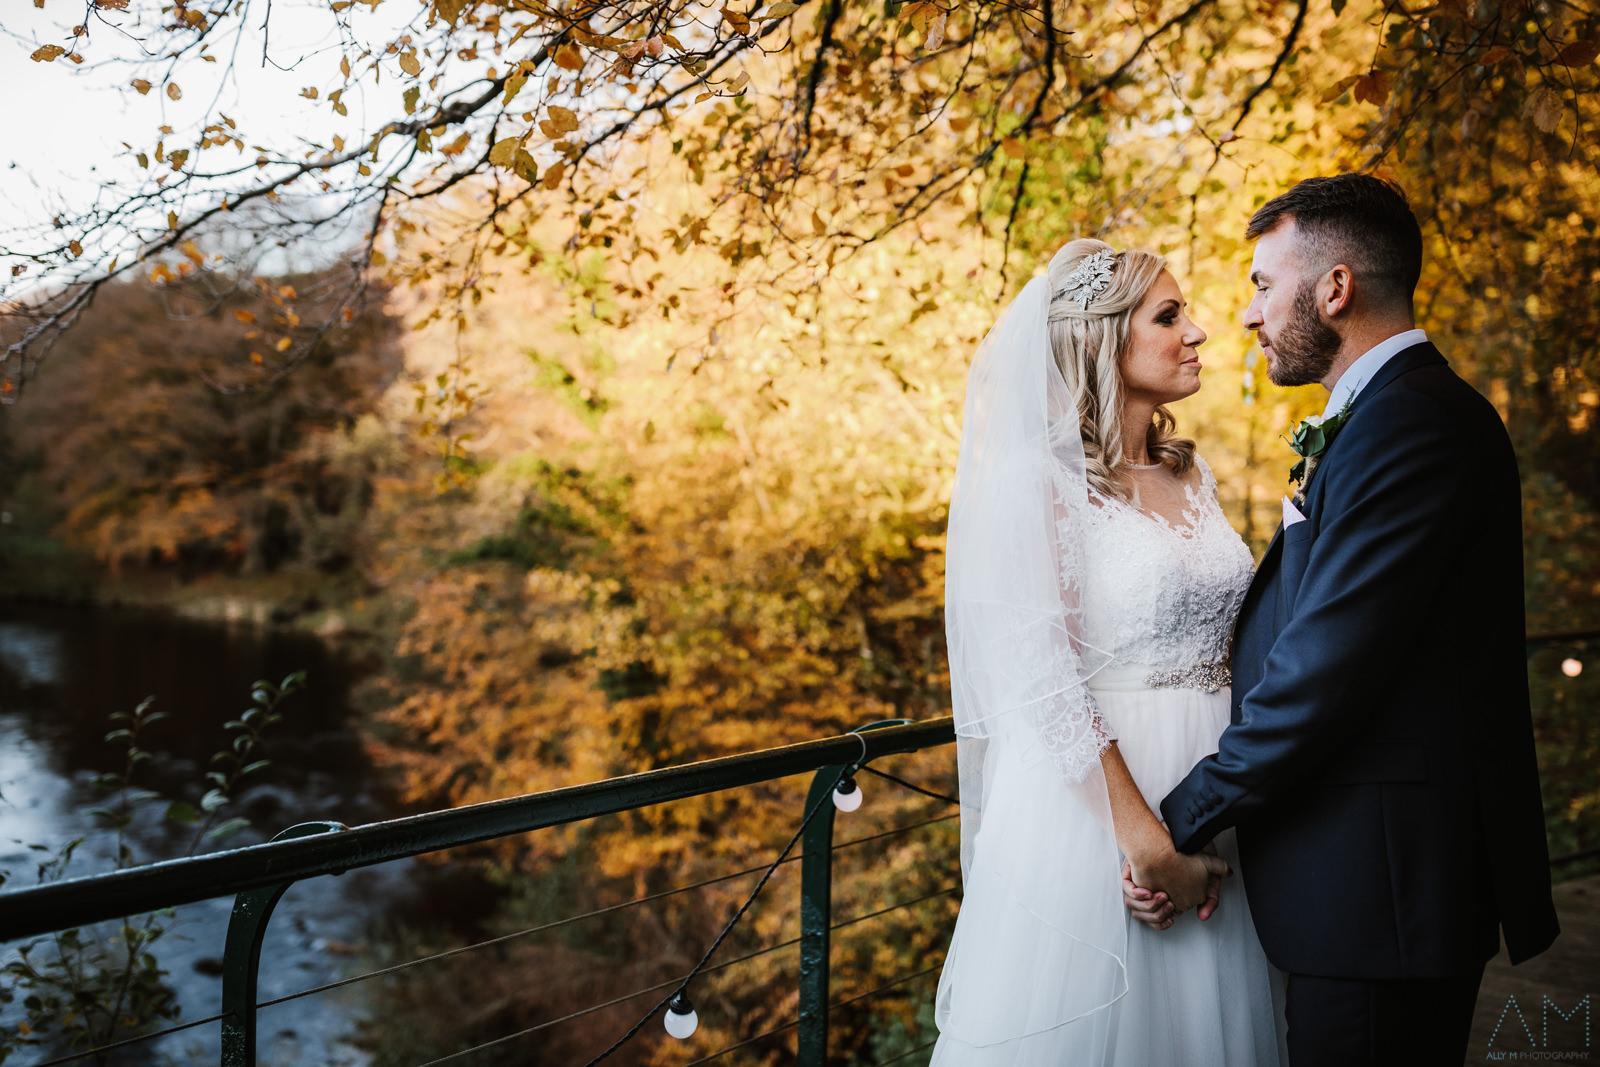 Inn at whitewell wedding photo